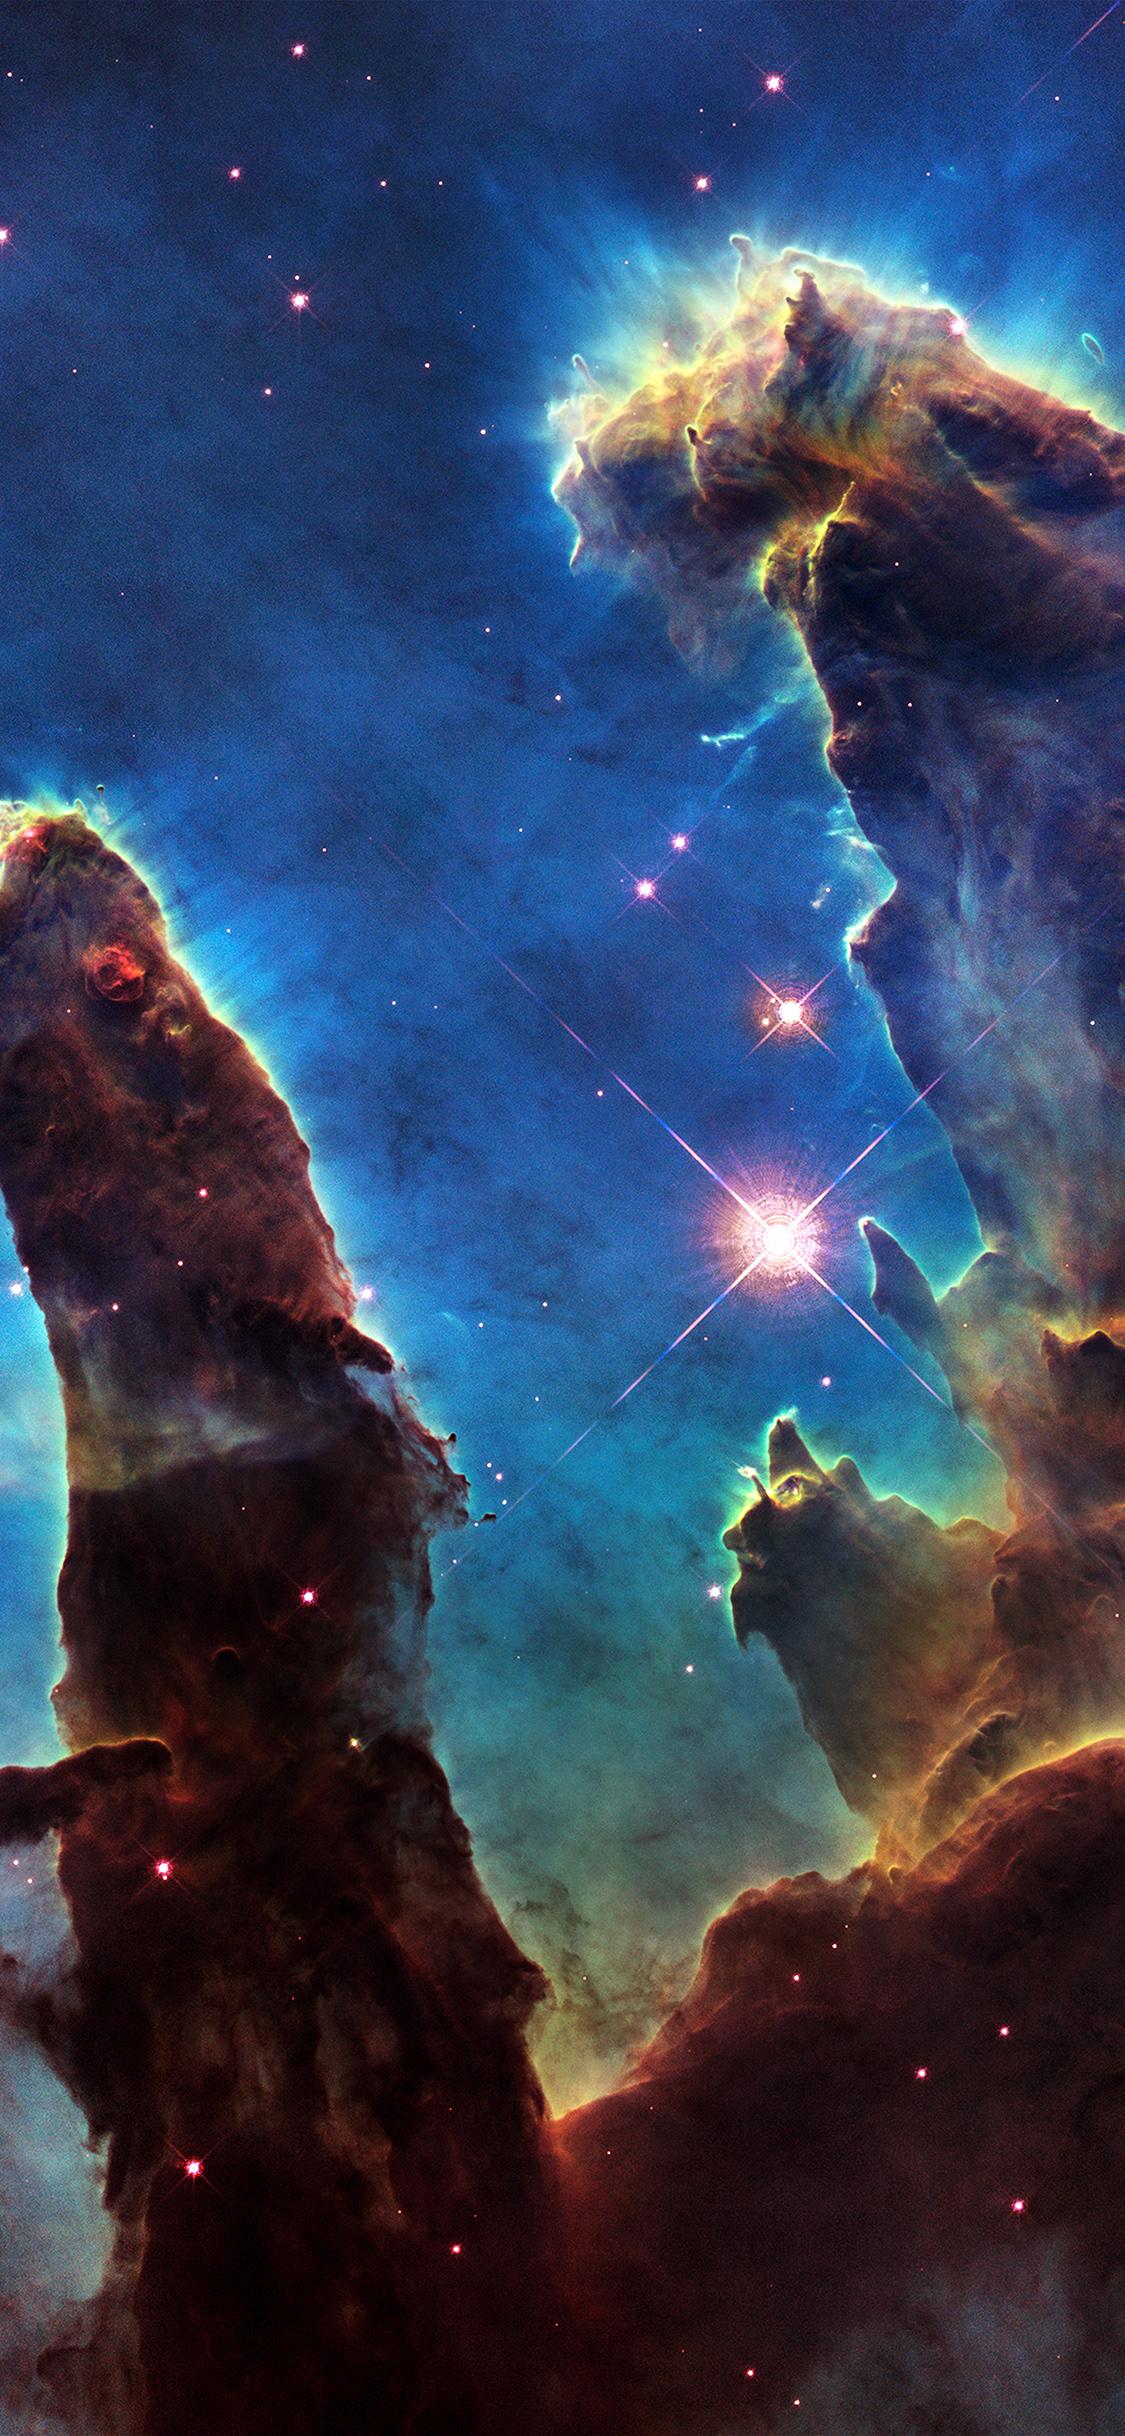 ao09-space-galaxy-star-far-night-science-nature-blue-wallpaper